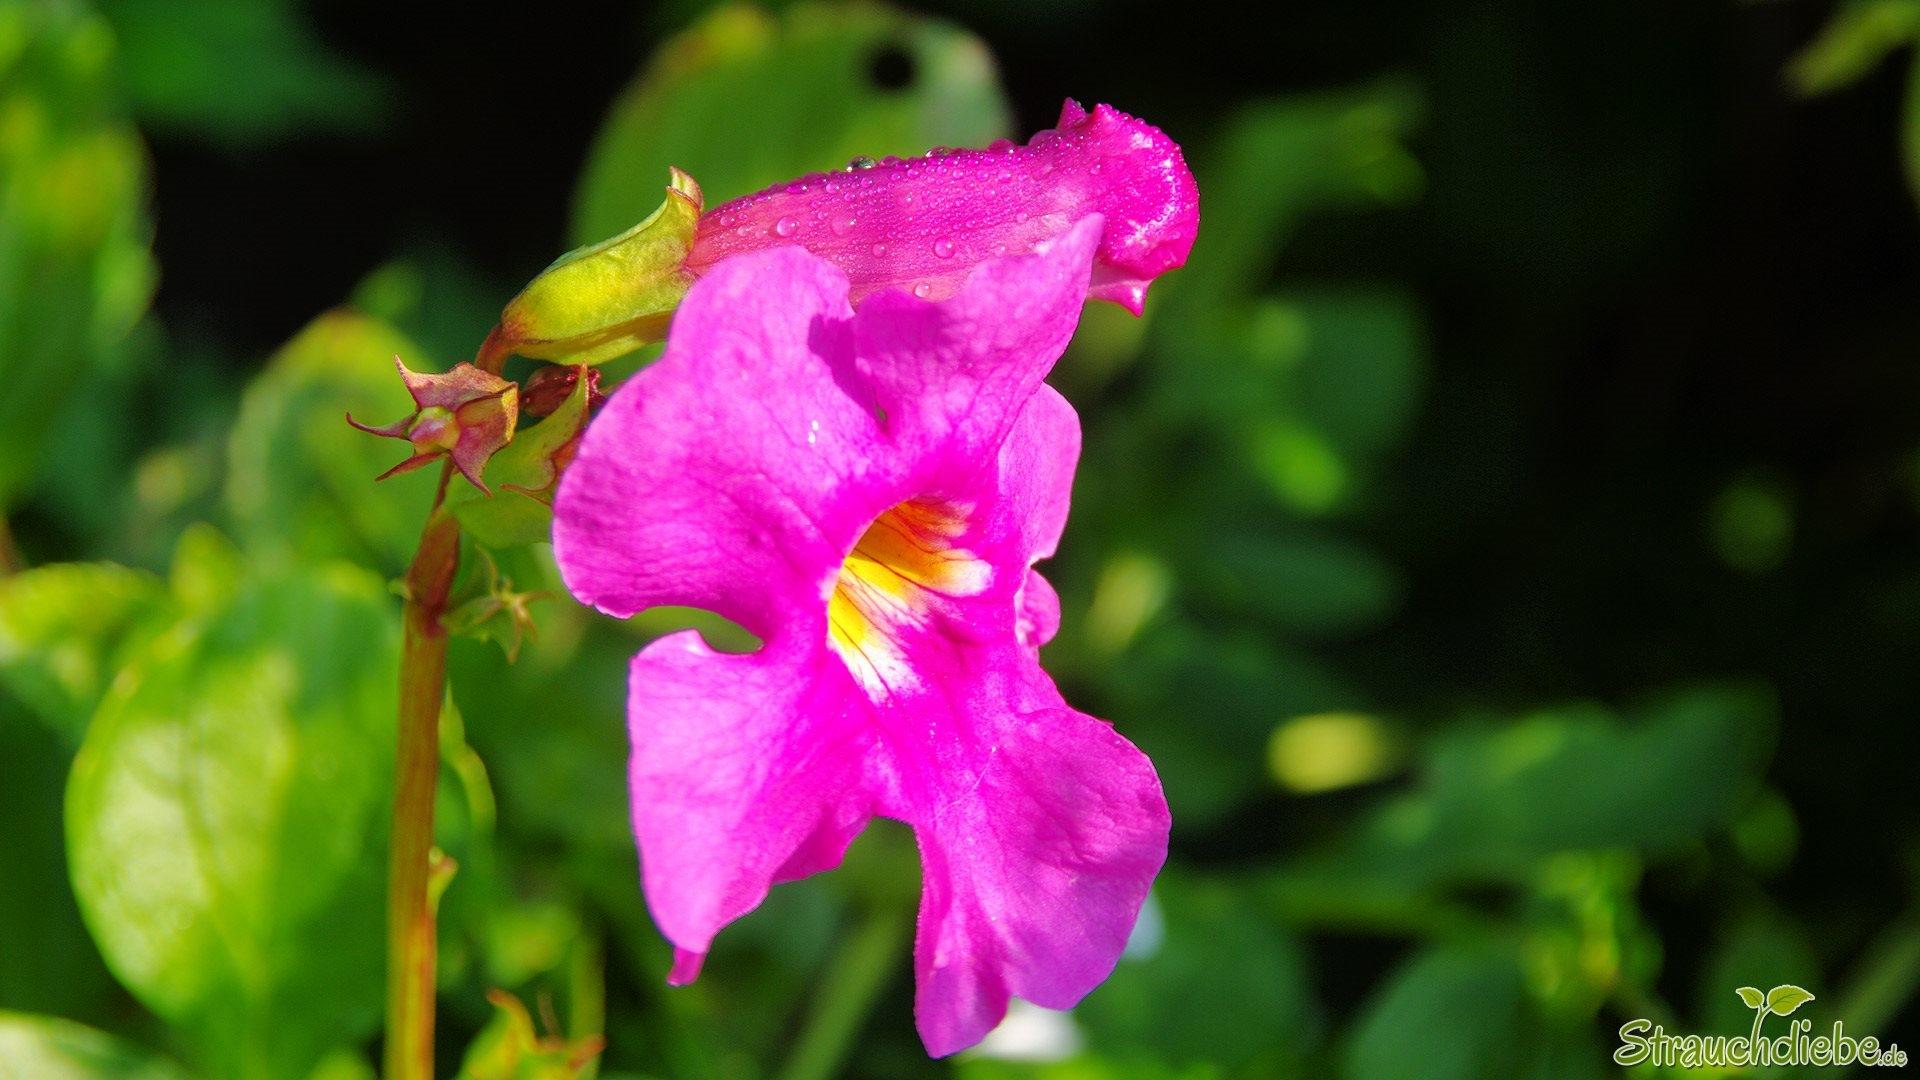 Gartengloxinie (Incarvillea delavayi)